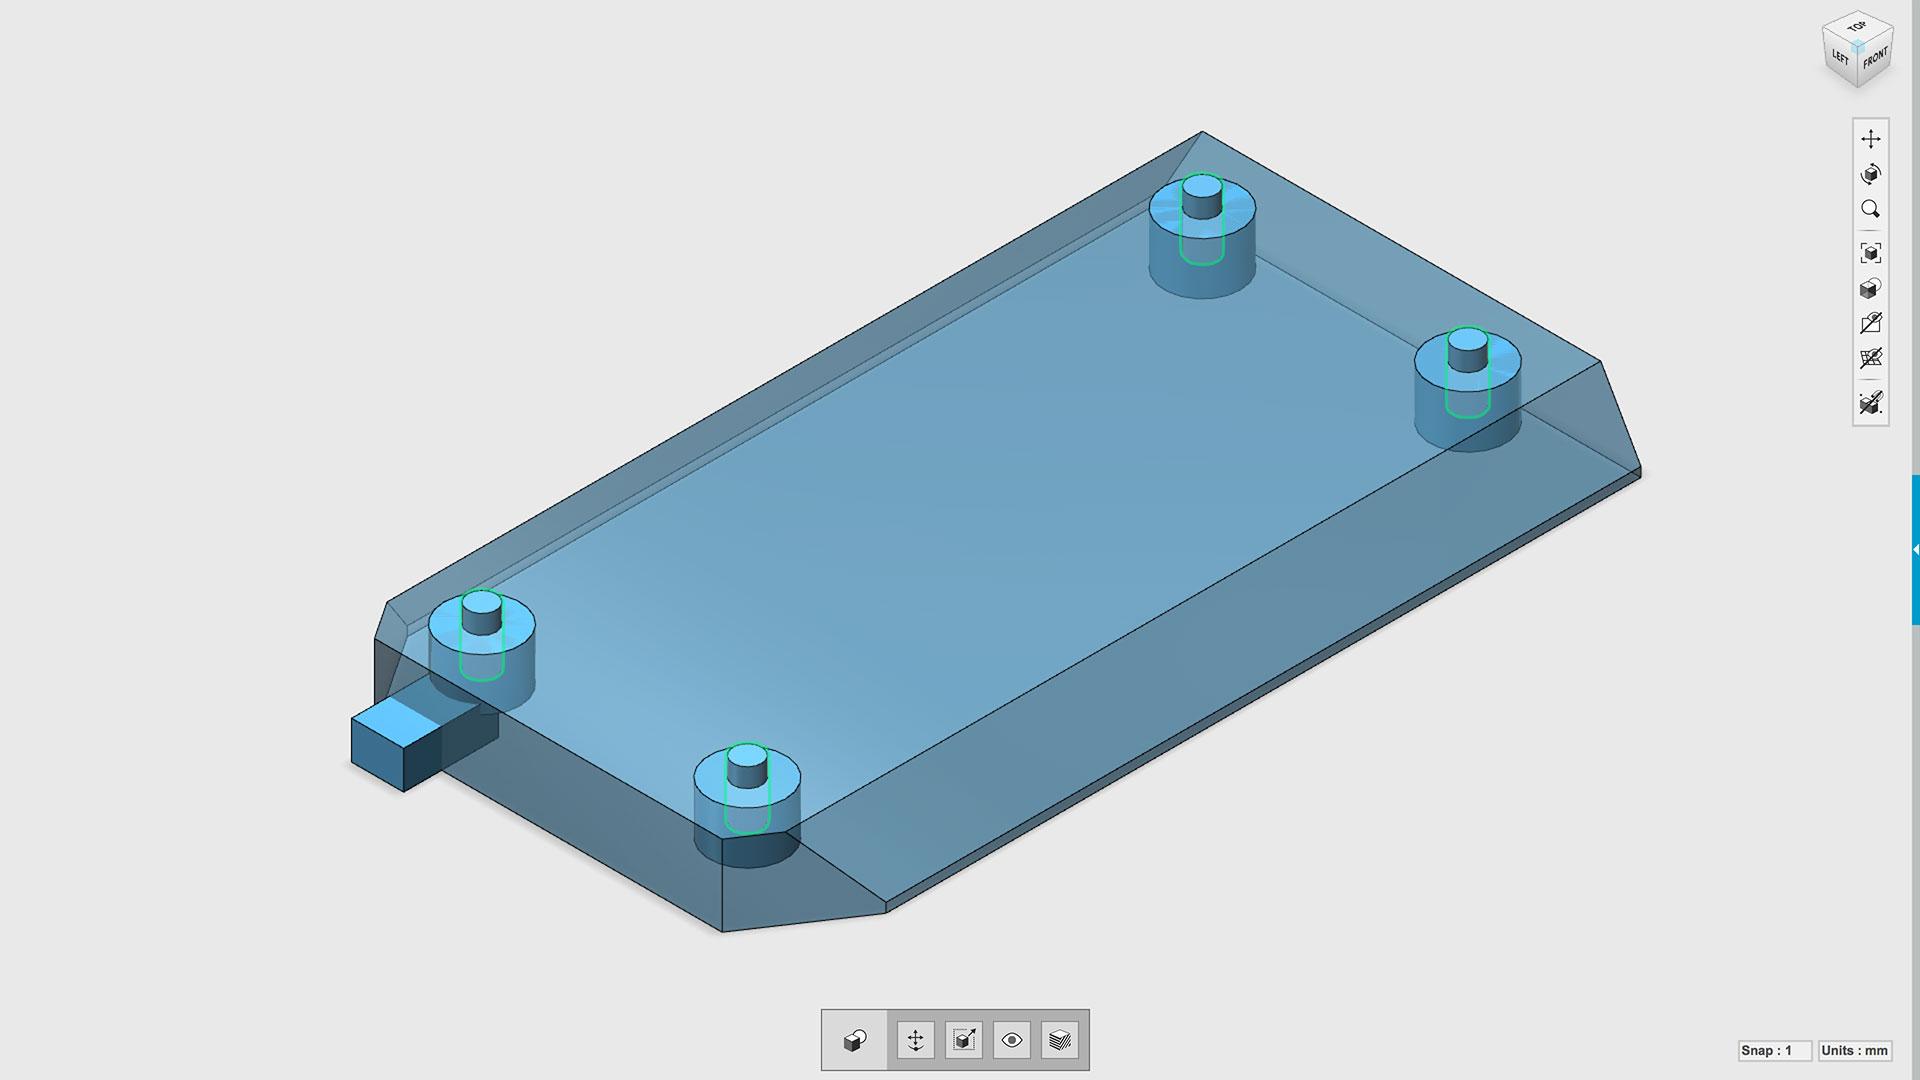 3d_printing_123d-plate.jpg